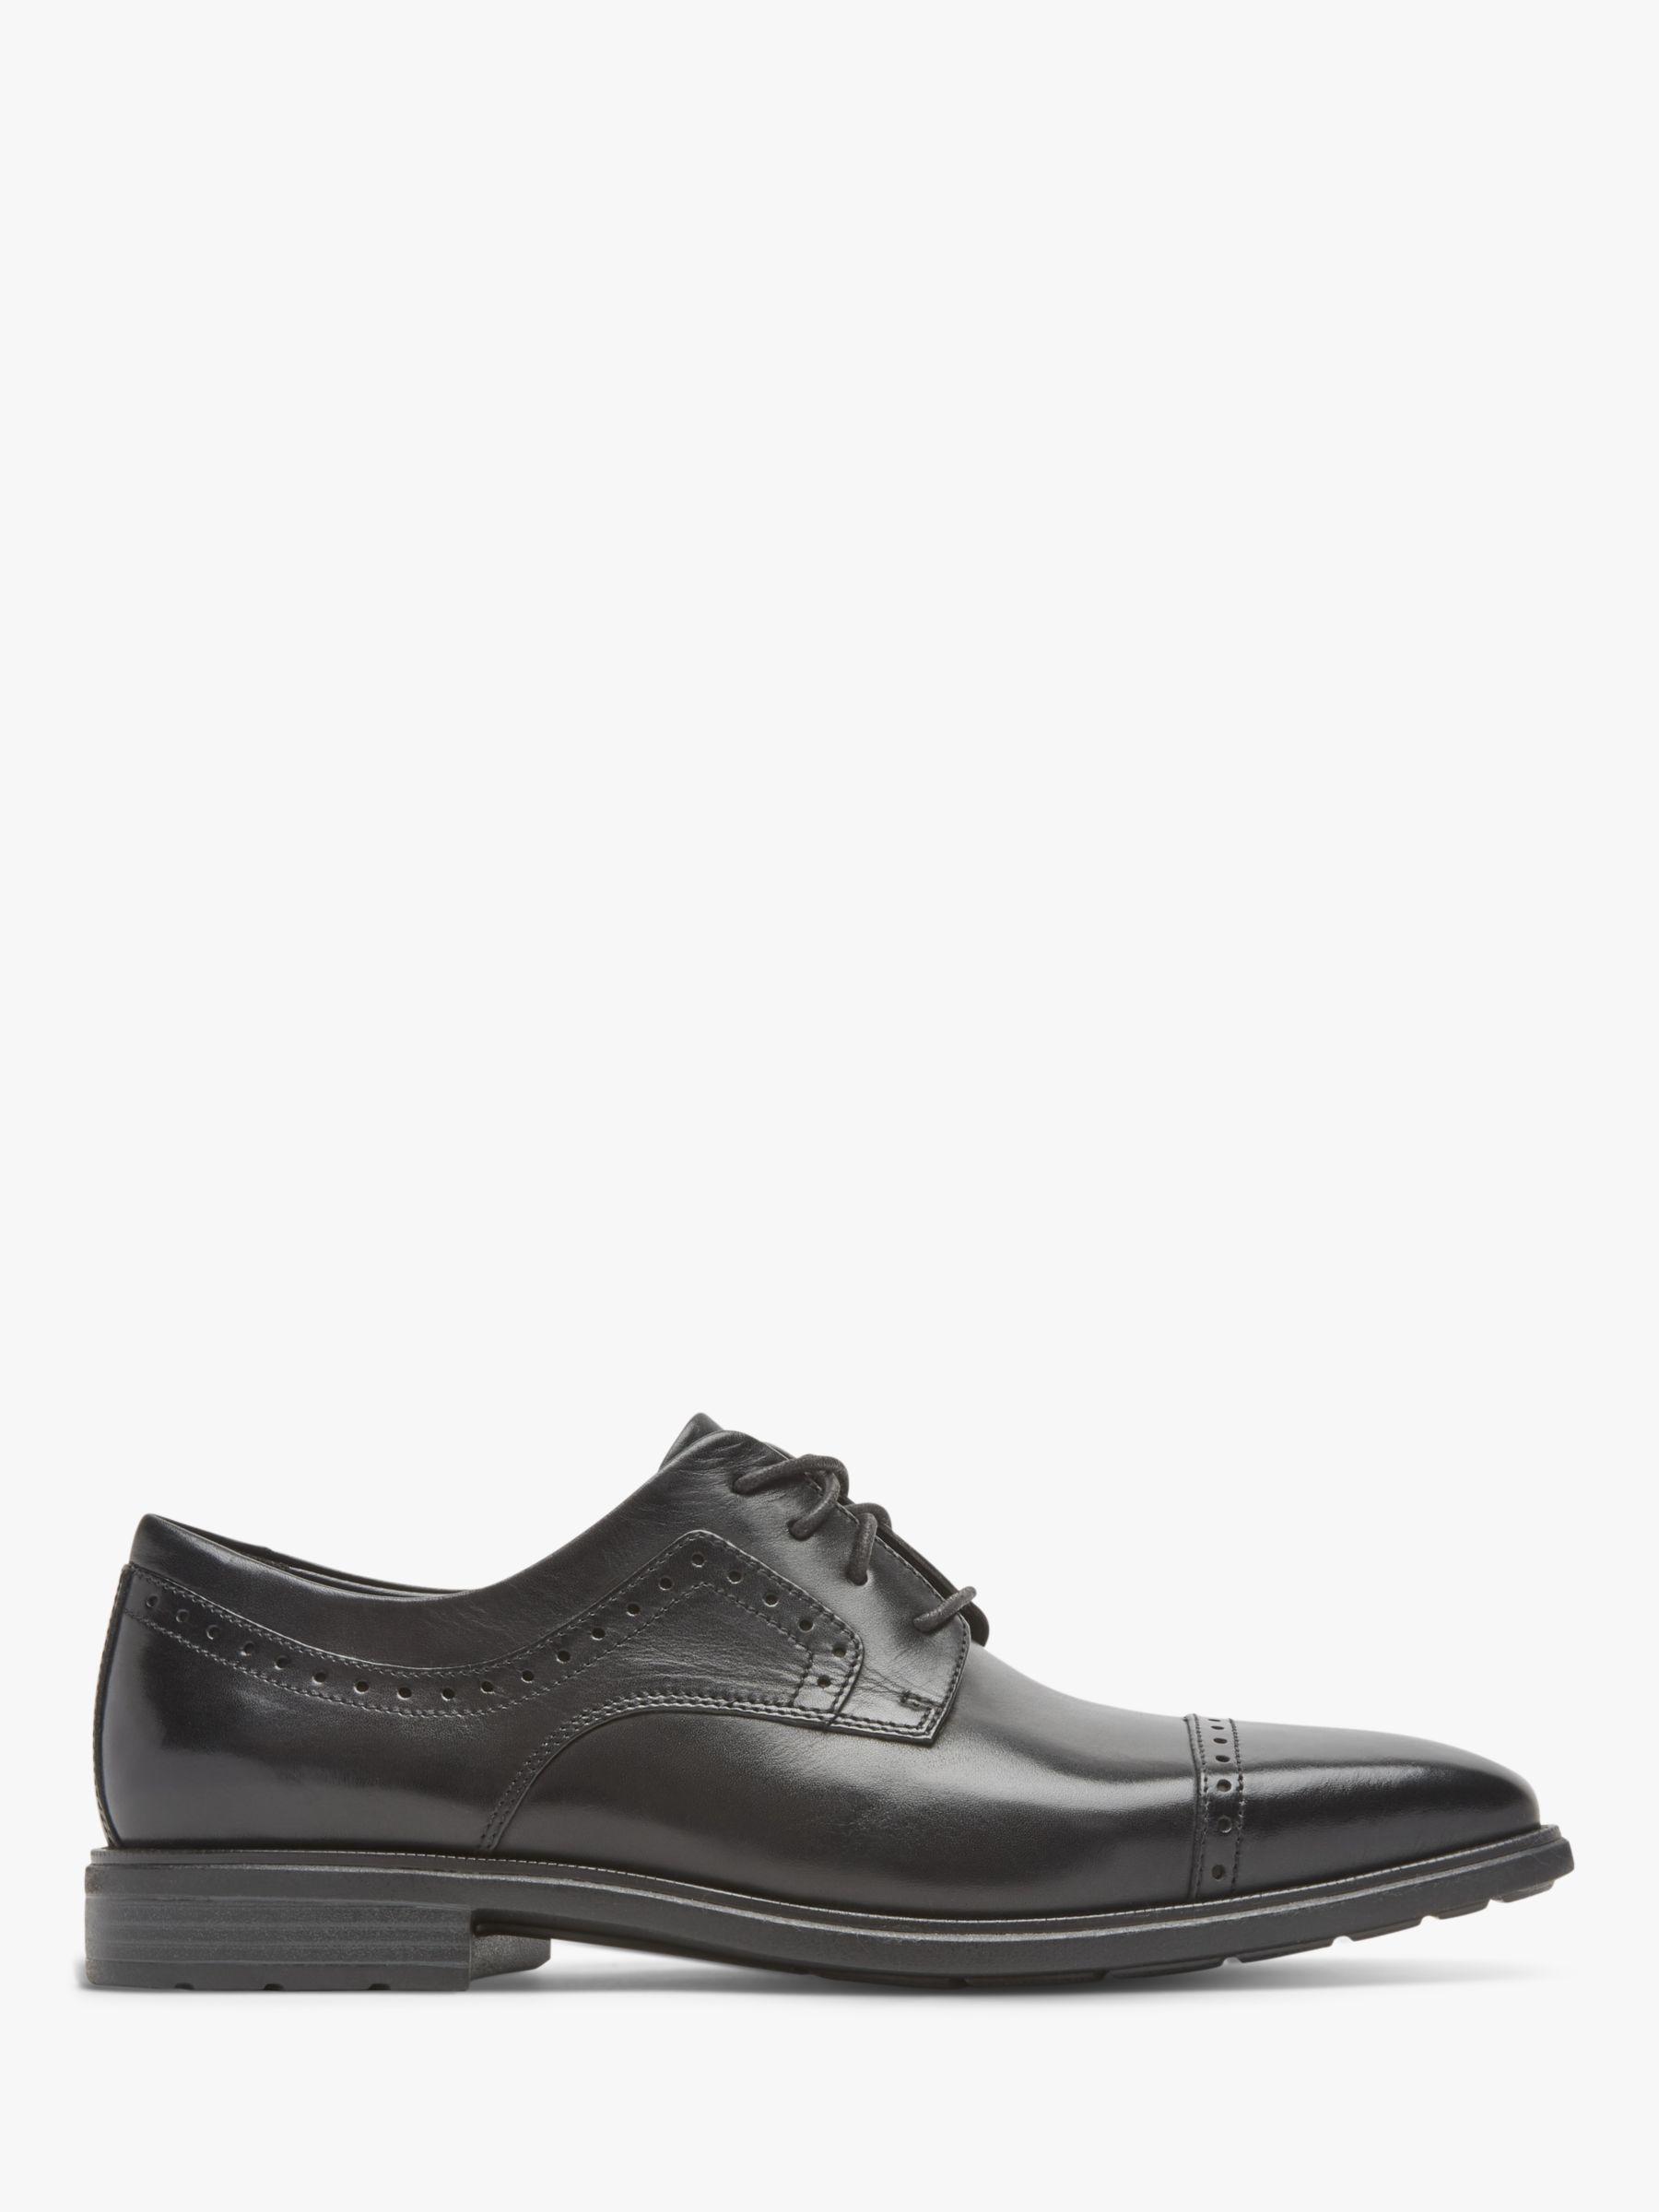 Rockport Rockport Business 2 Leather Derby Shoes, Black Glass